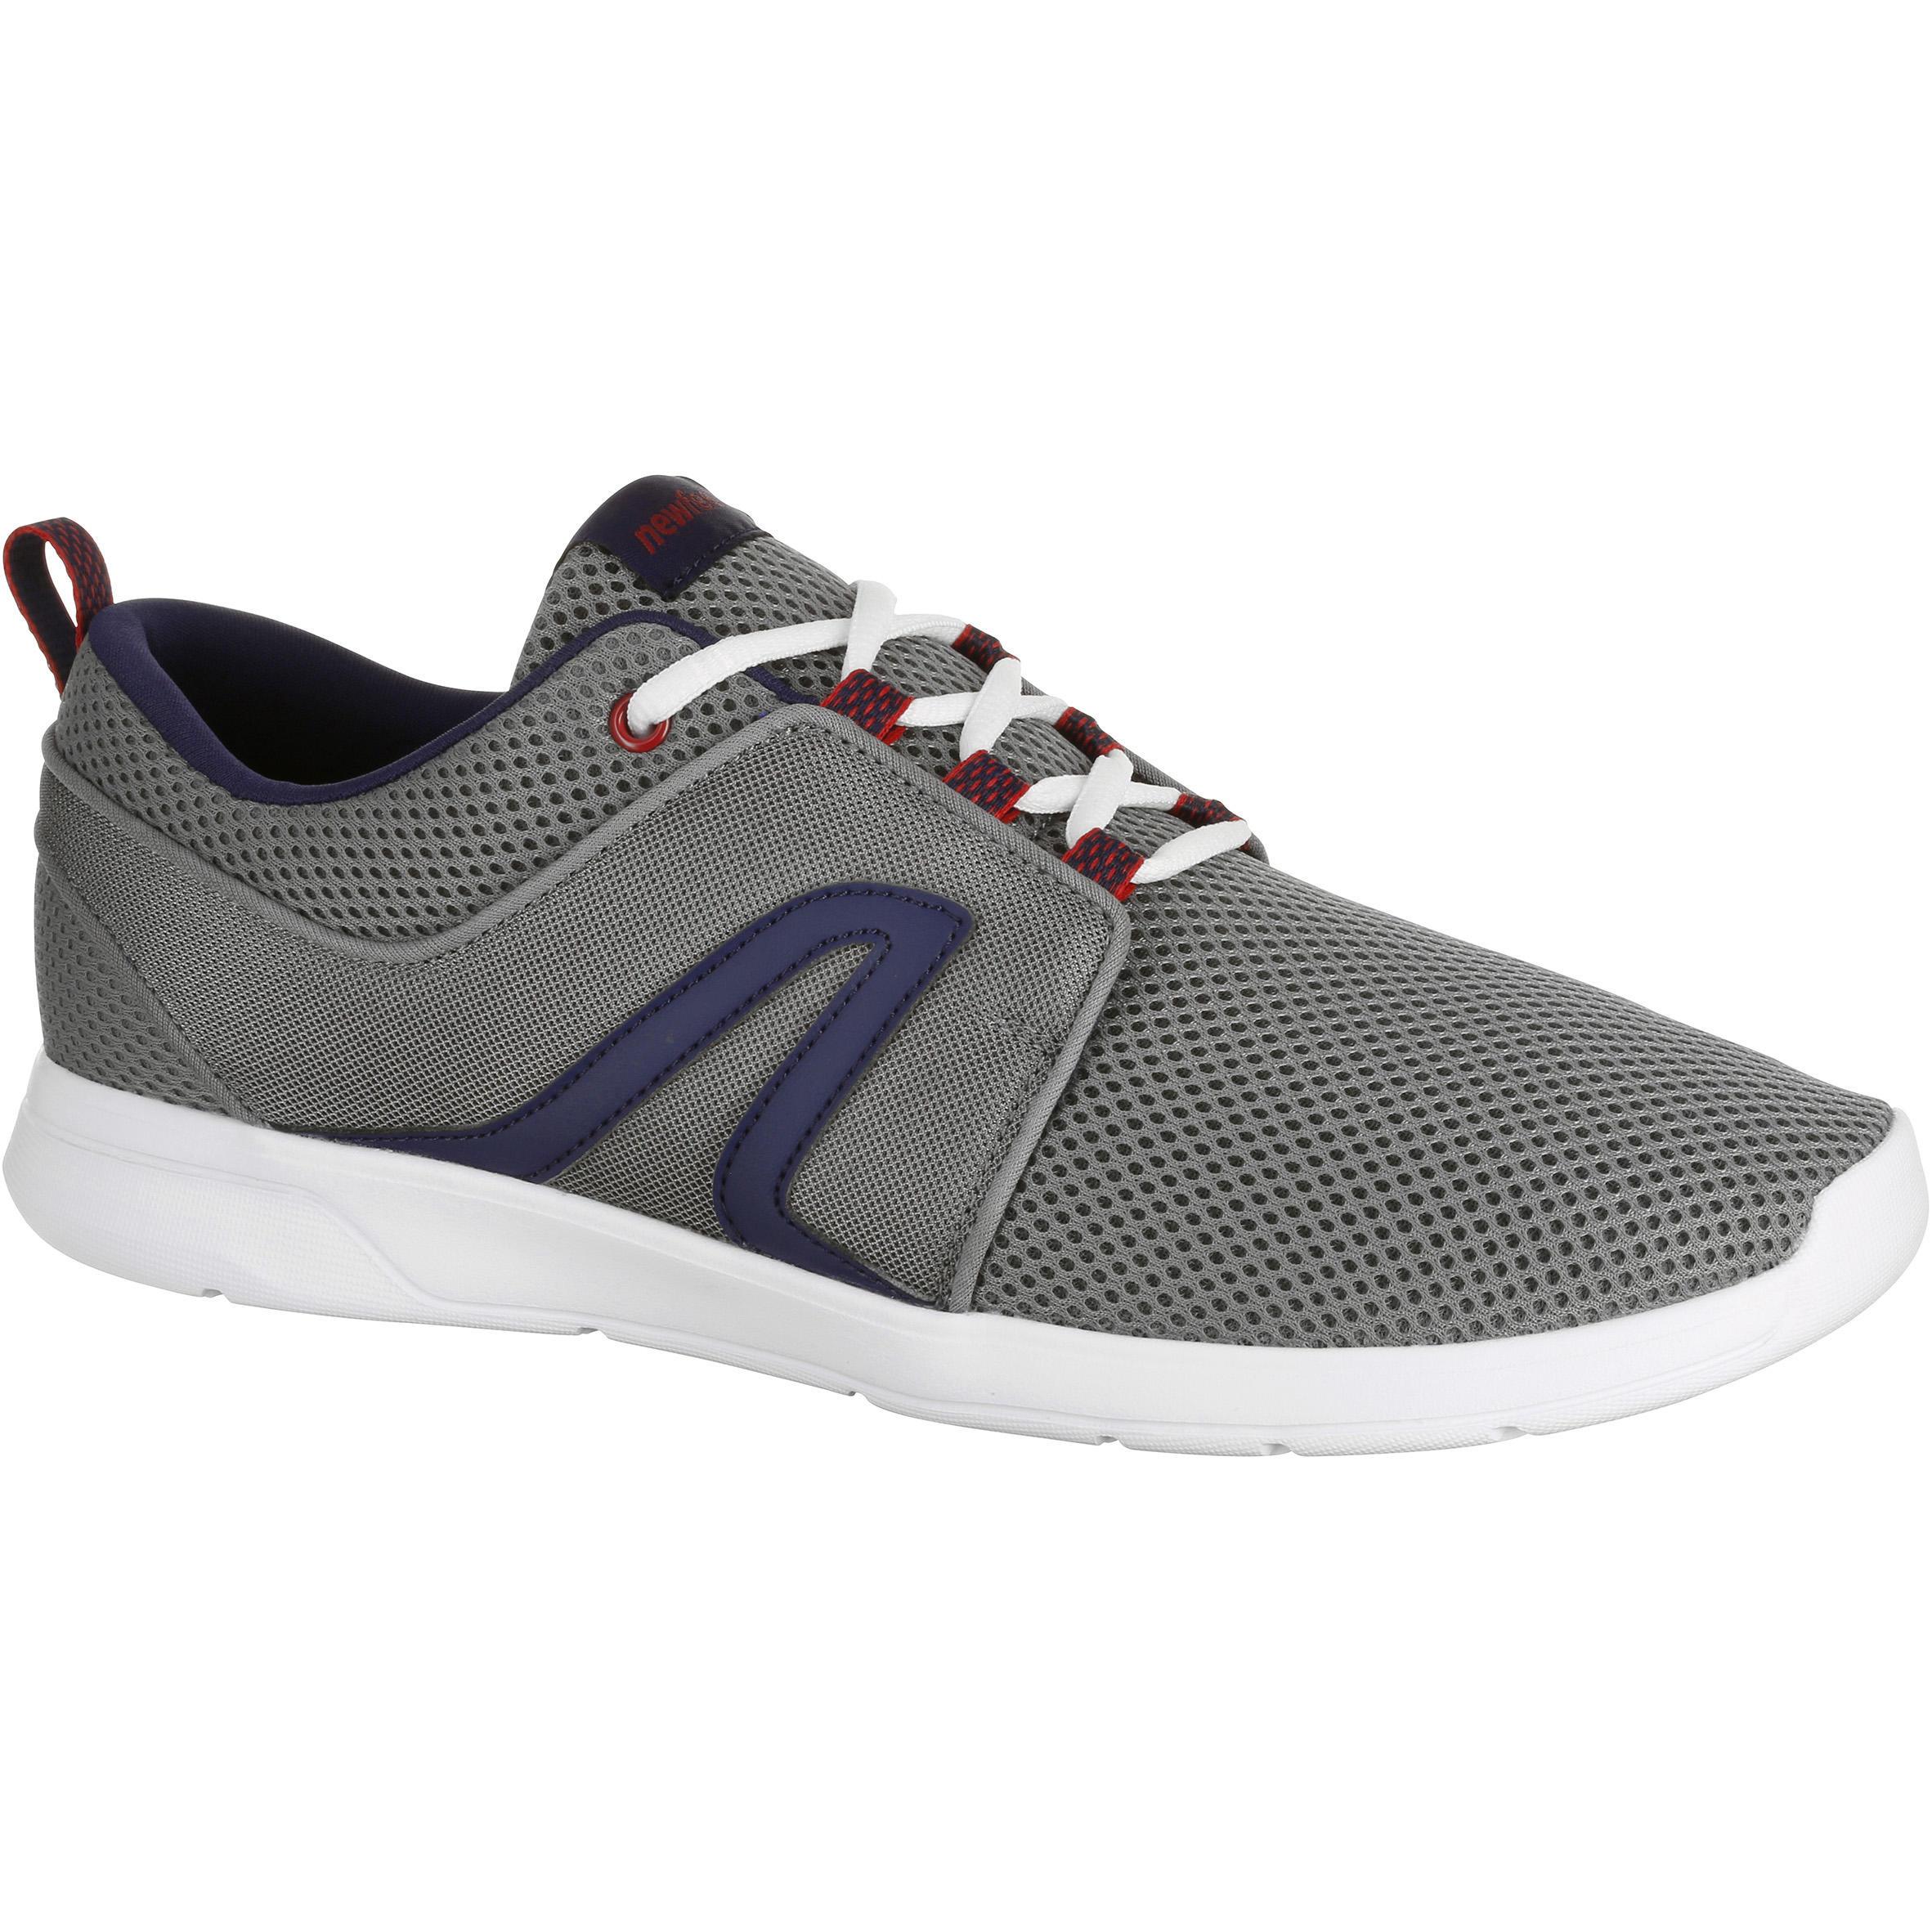 Walkingschuhe Soft 140 Mesh Herren | Schuhe > Sportschuhe > Walkingschuhe | Newfeel